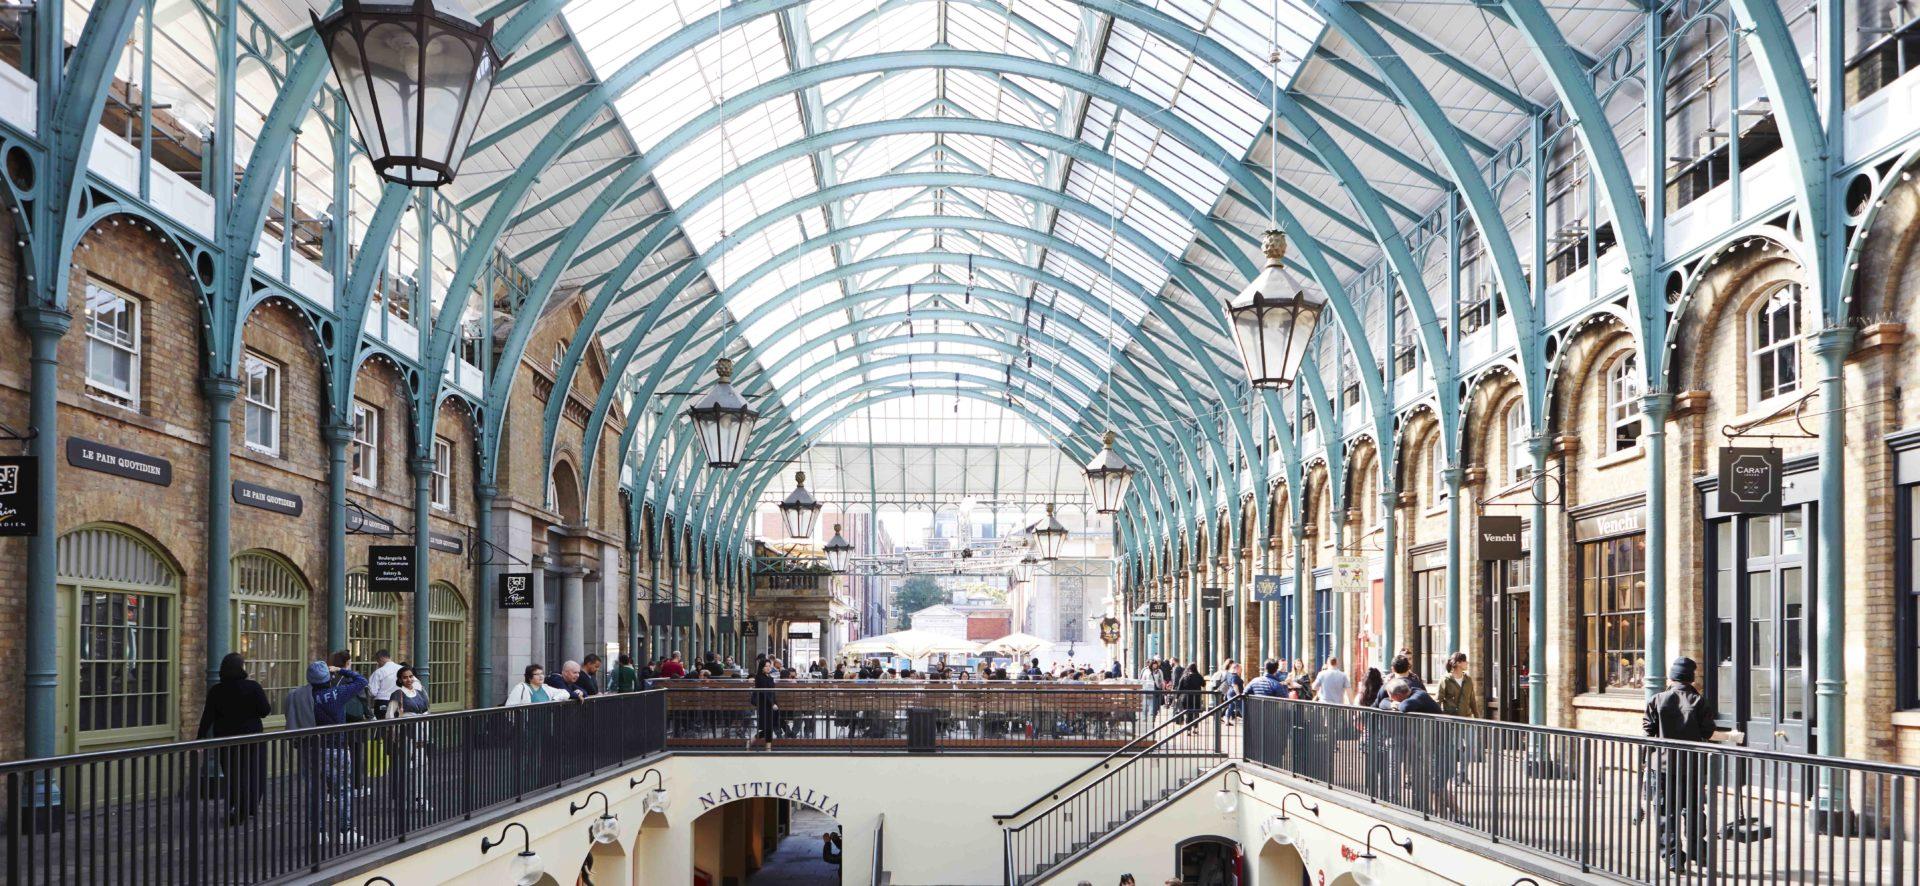 Galleries The Grand At Trafalgar Square